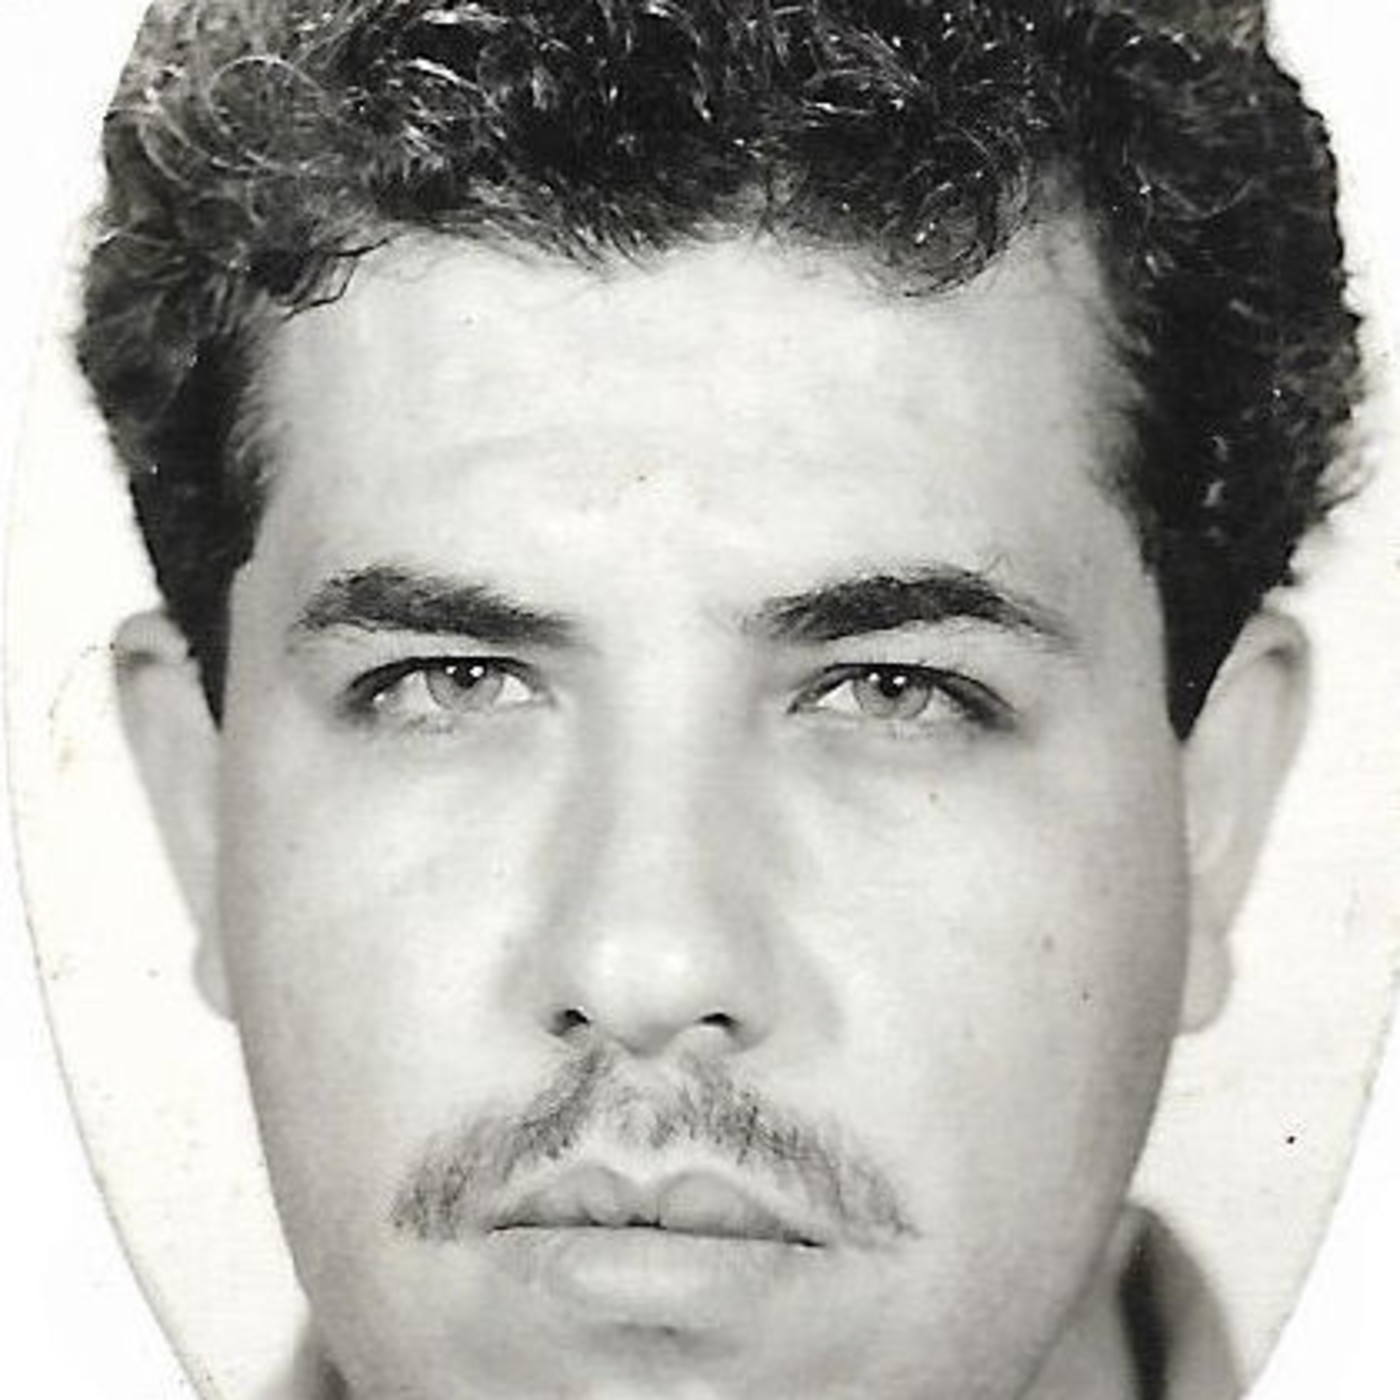 Cesar Cavazos